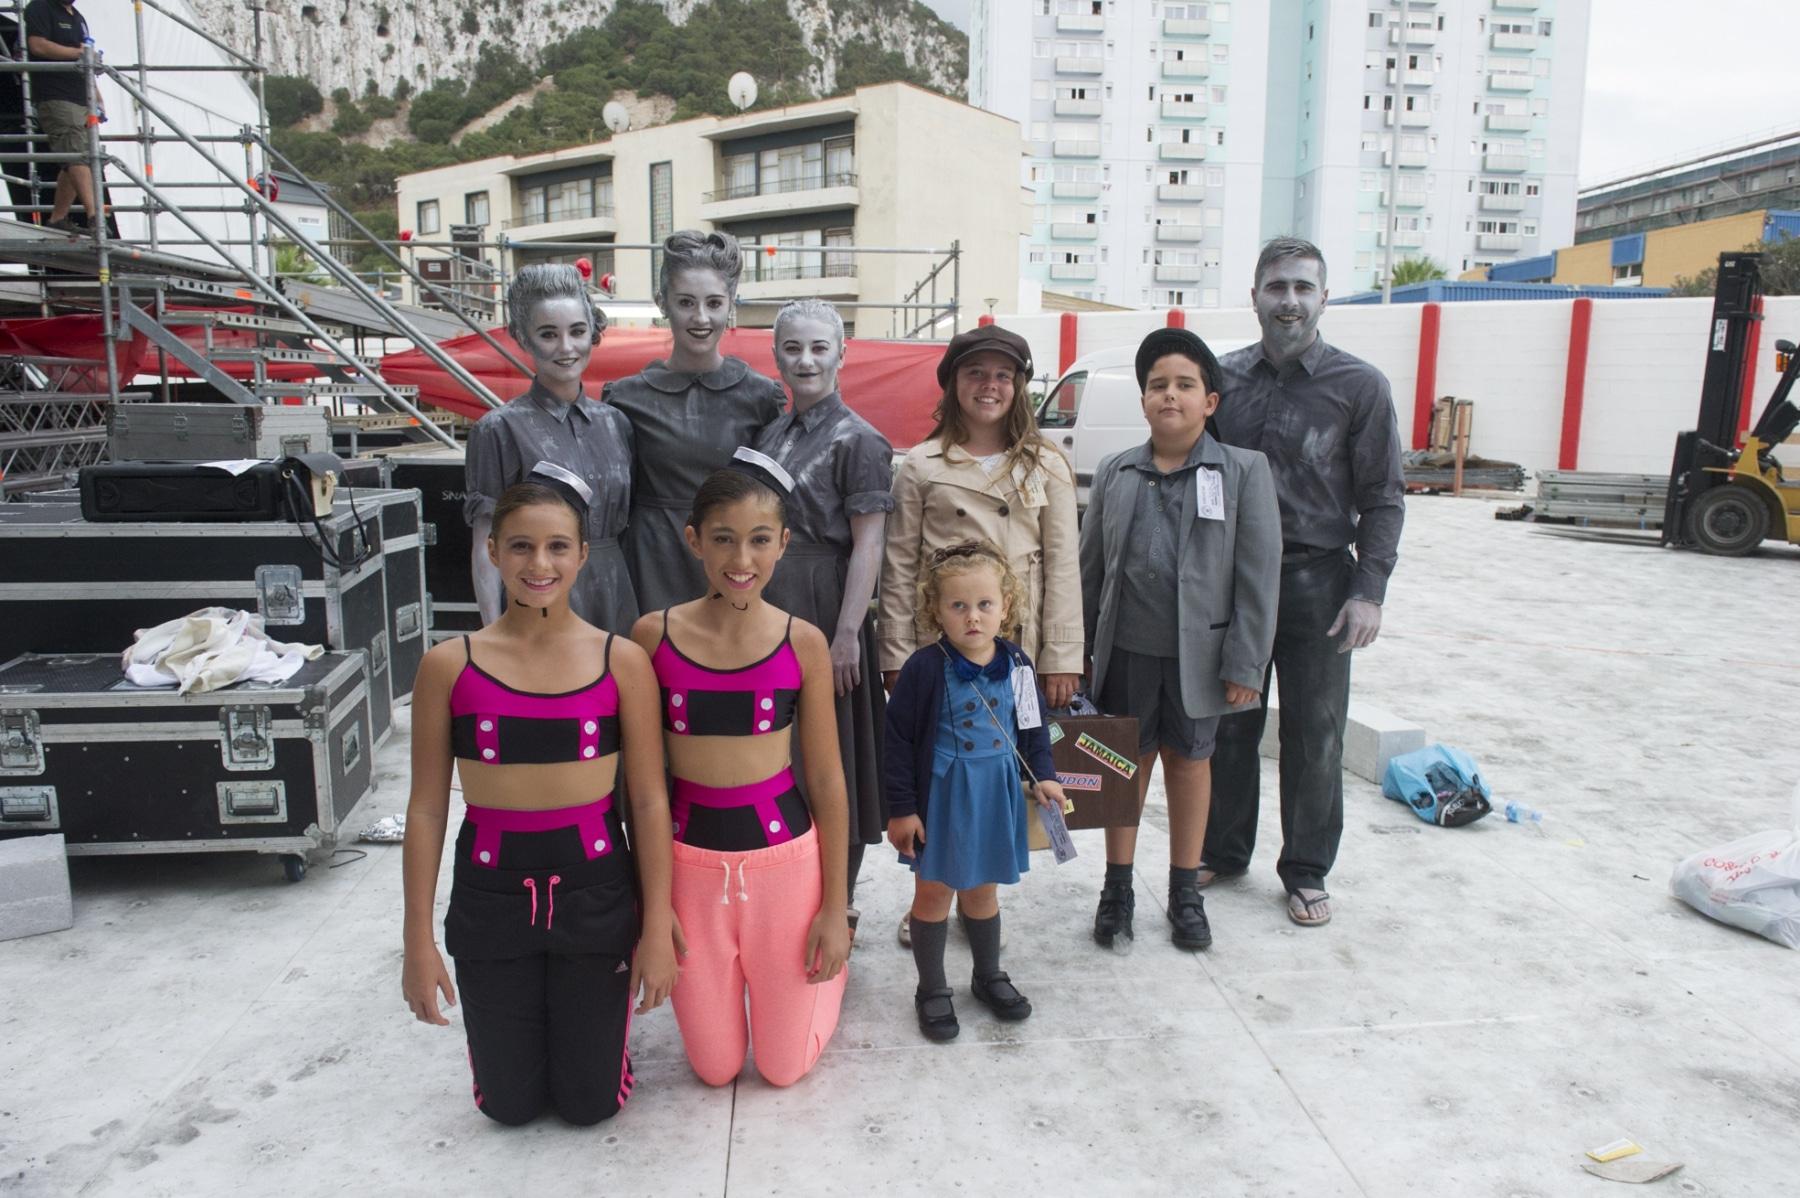 concierto-evacuados-de-gibraltar-07092015-10bn_21052080459_o